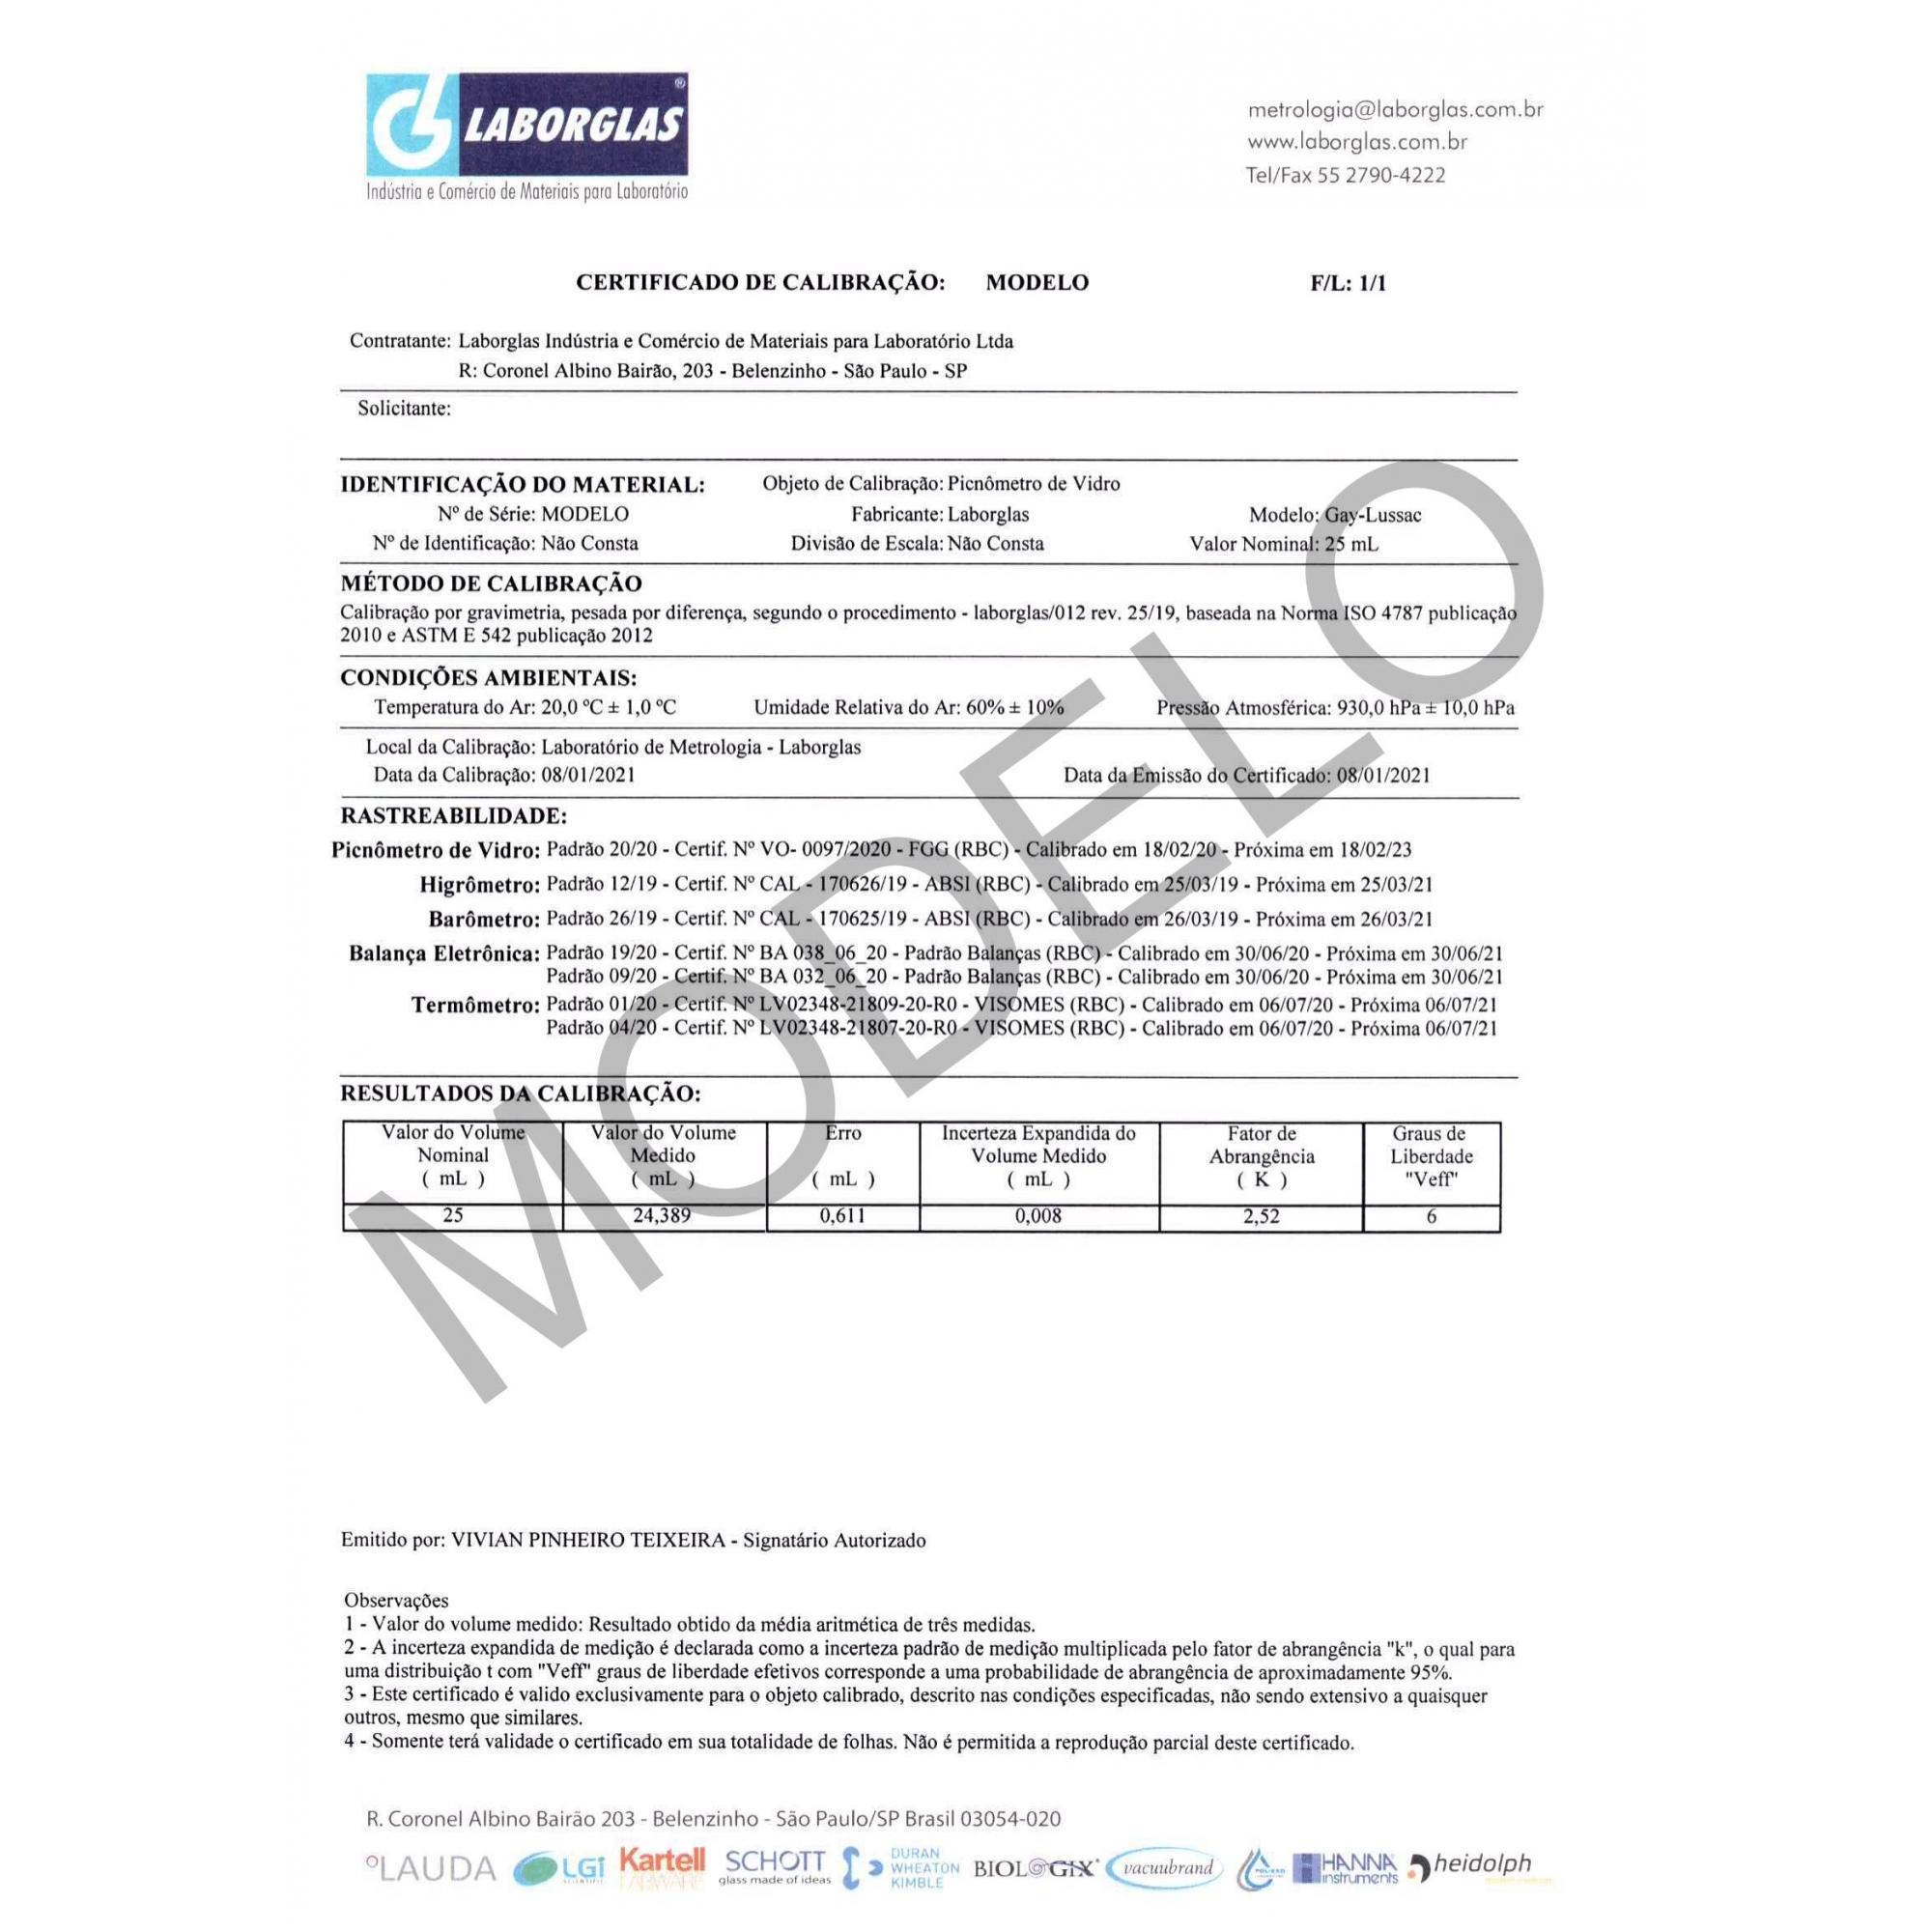 PICNÔMETRO GAY-LUSSAC SEM TERMÔMETRO 1000 ML CERTIFICADO RASTREÁVEL - Laborglas - Cód. 9491154-C